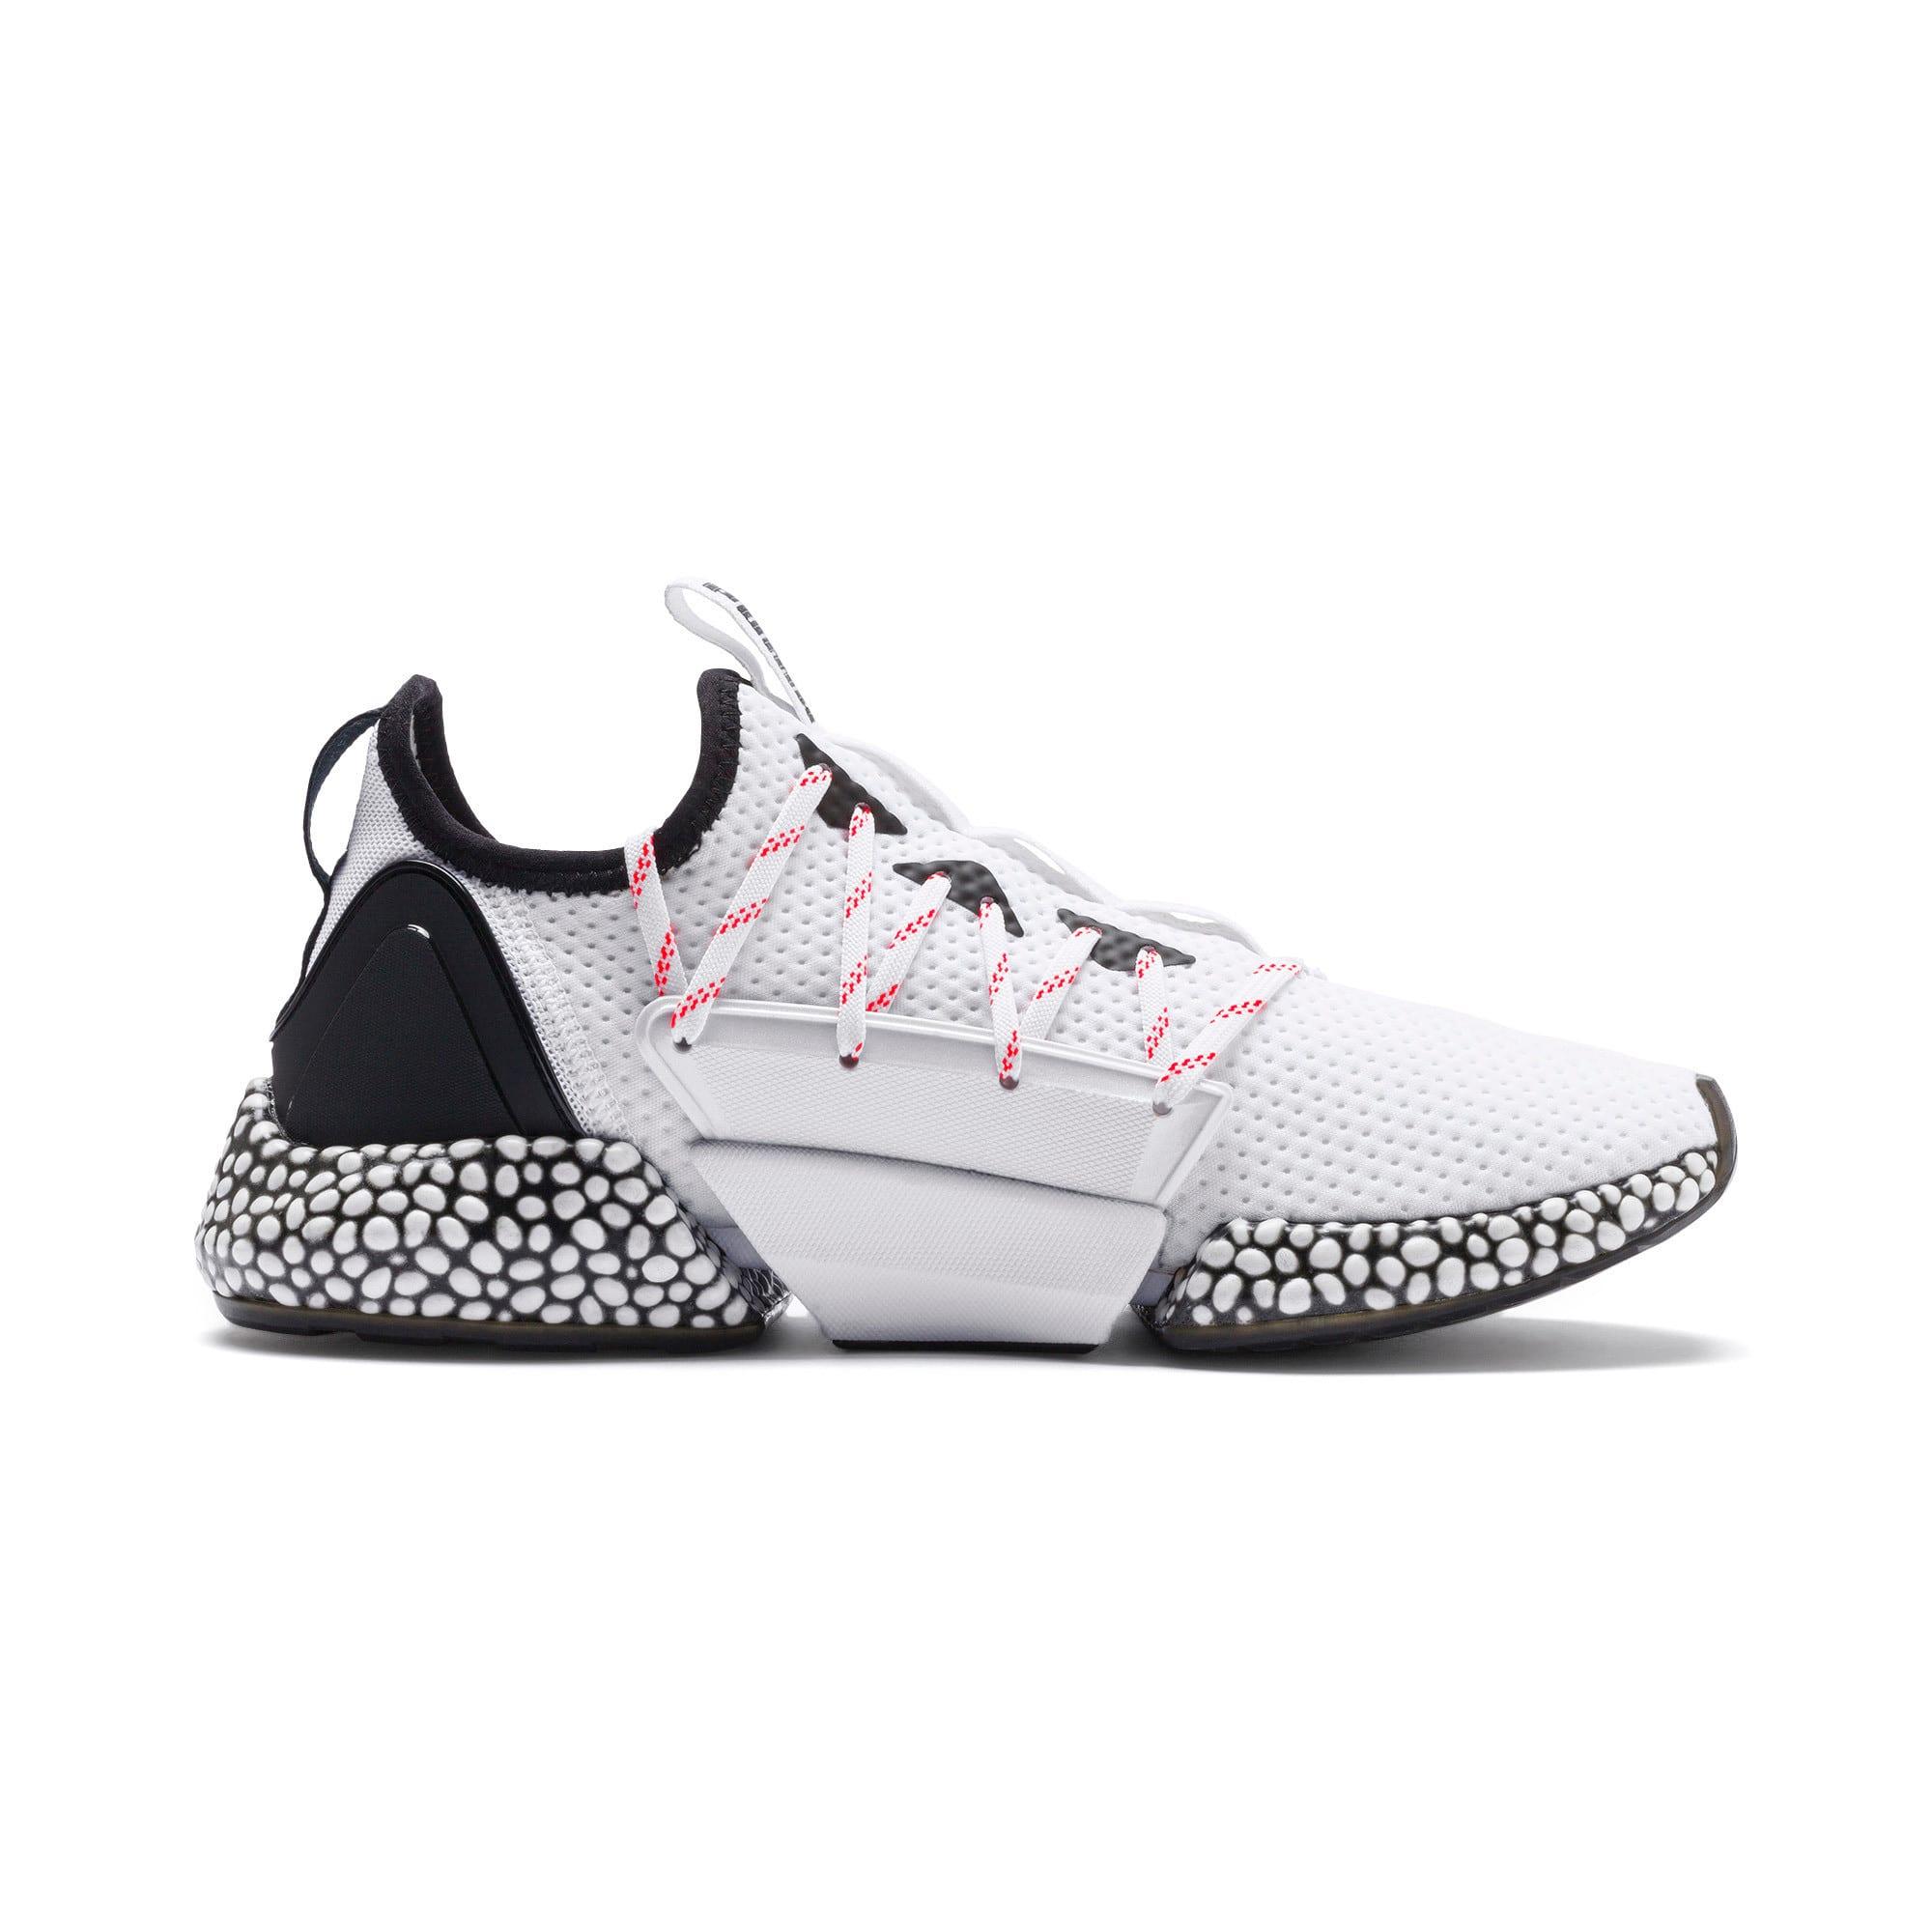 Thumbnail 6 of HYBRID Rocket Aero Men's Sneakers, Puma White-Puma Black, medium